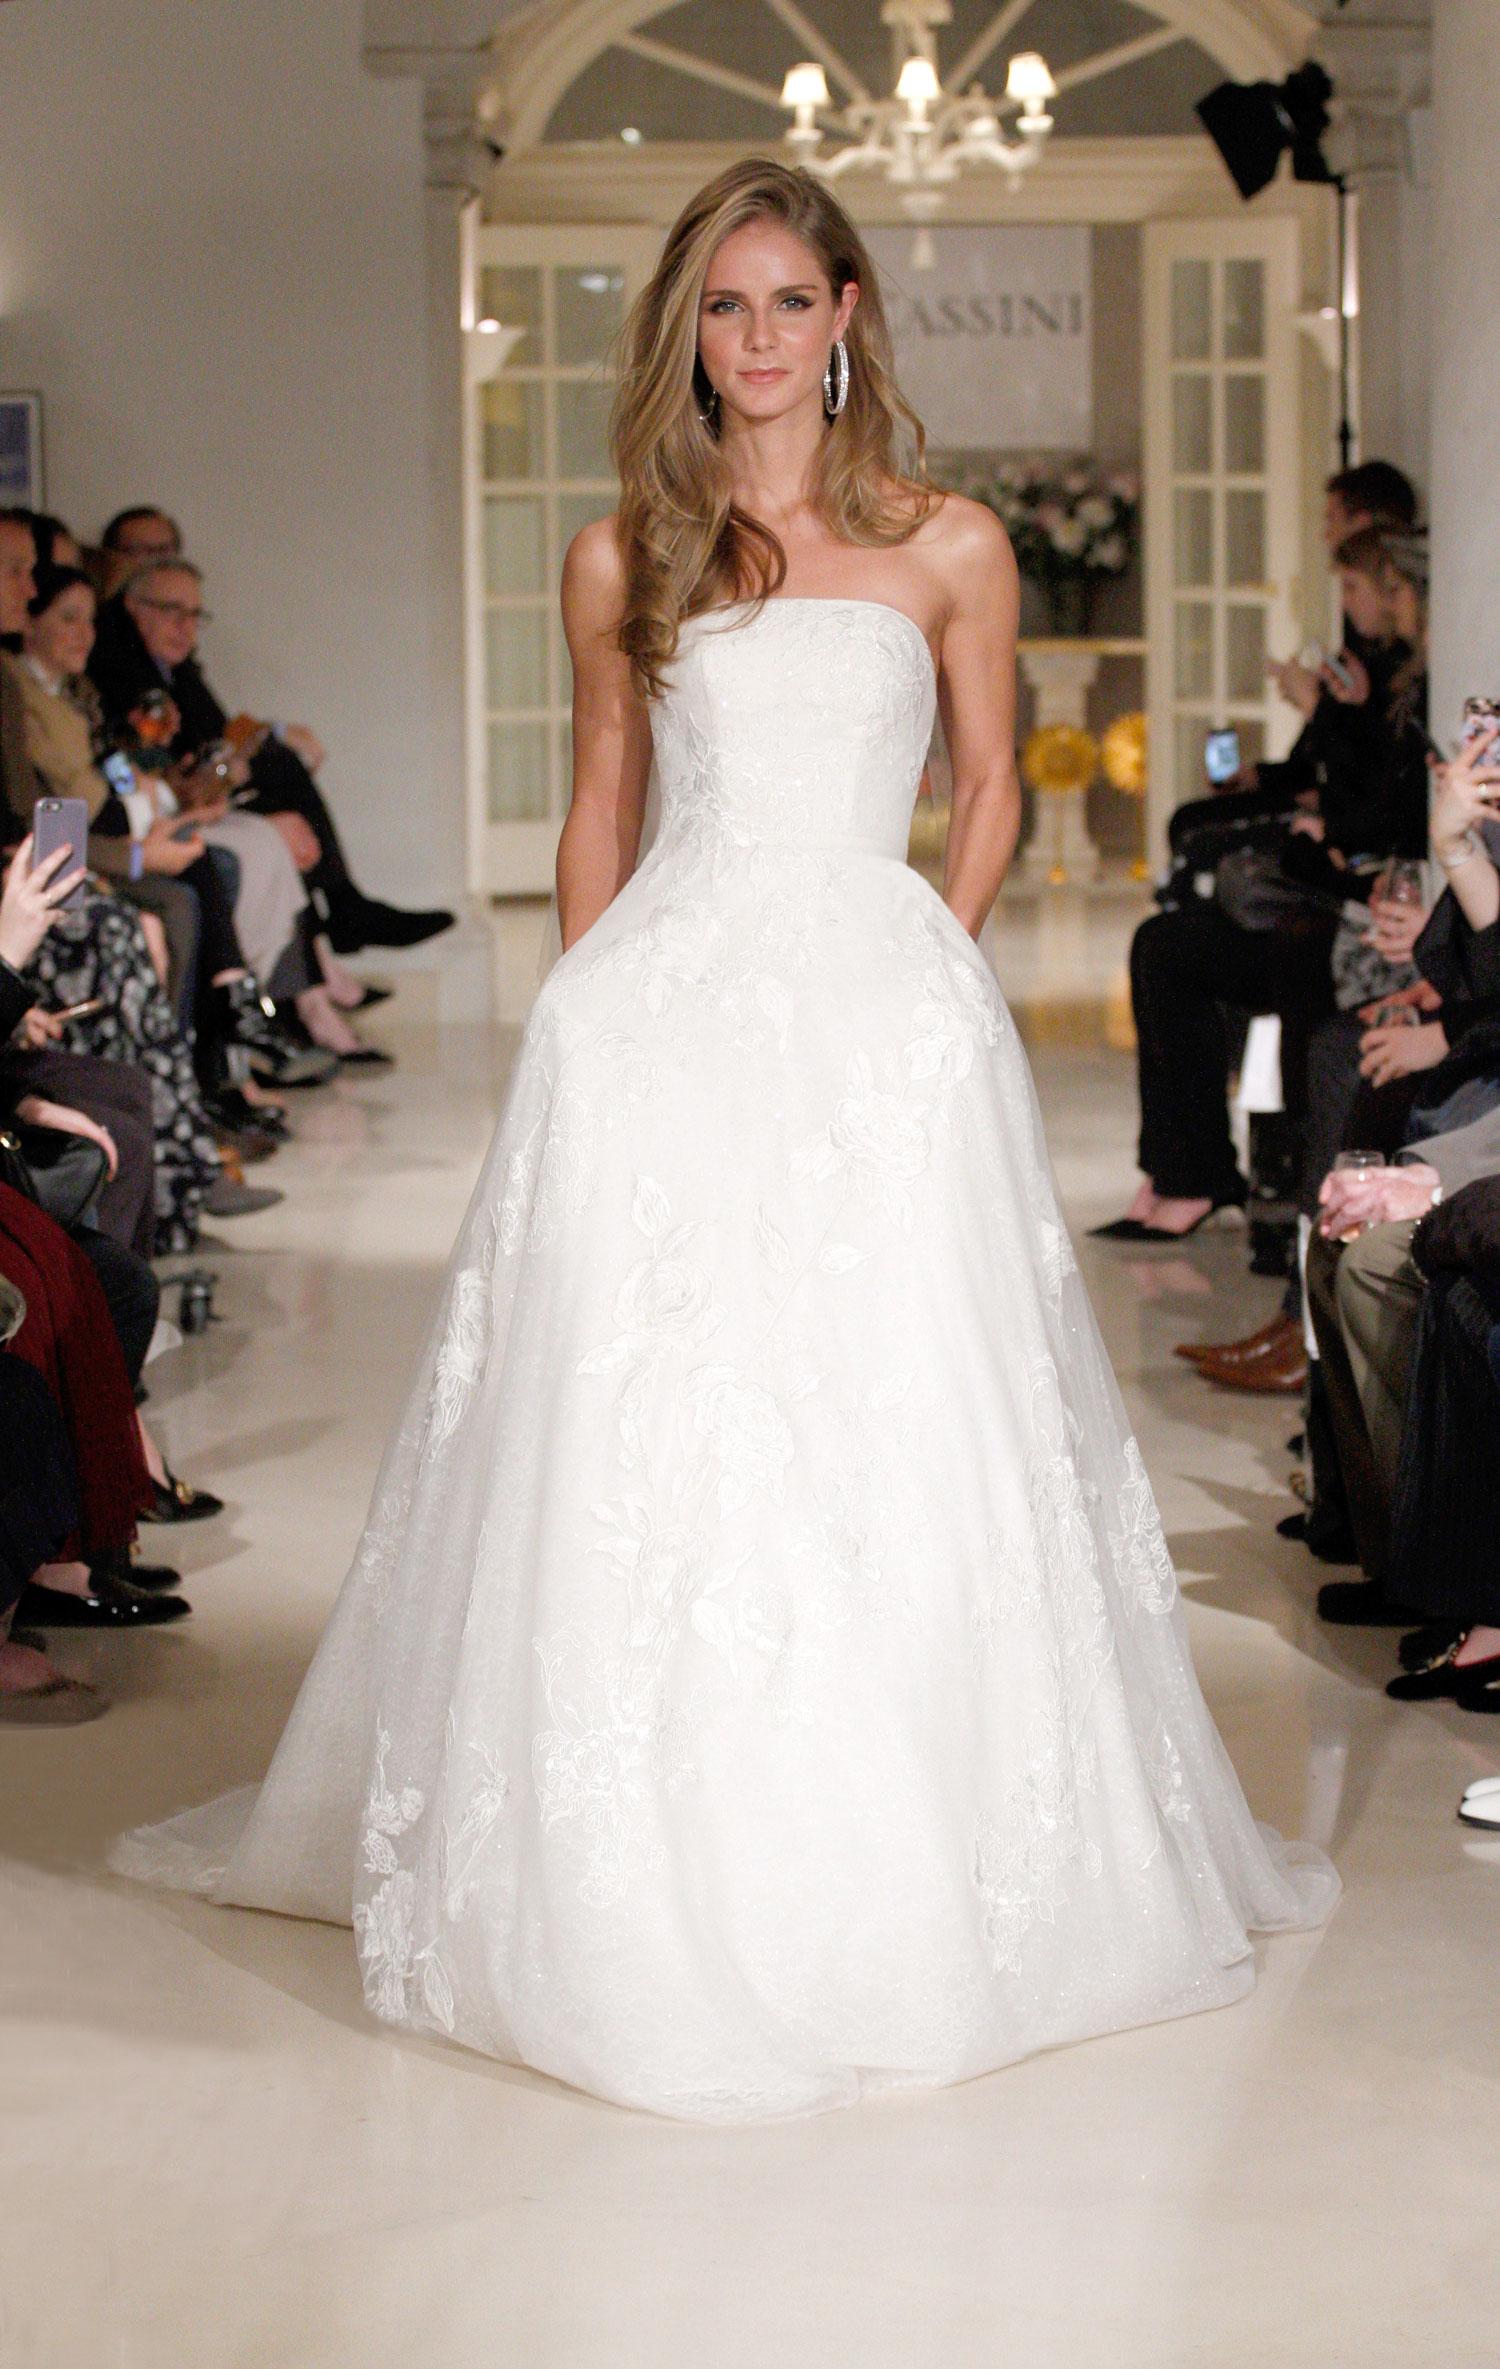 Oleg Cassini ball gown strapless dress pockets royal wedding inspired bridal gown